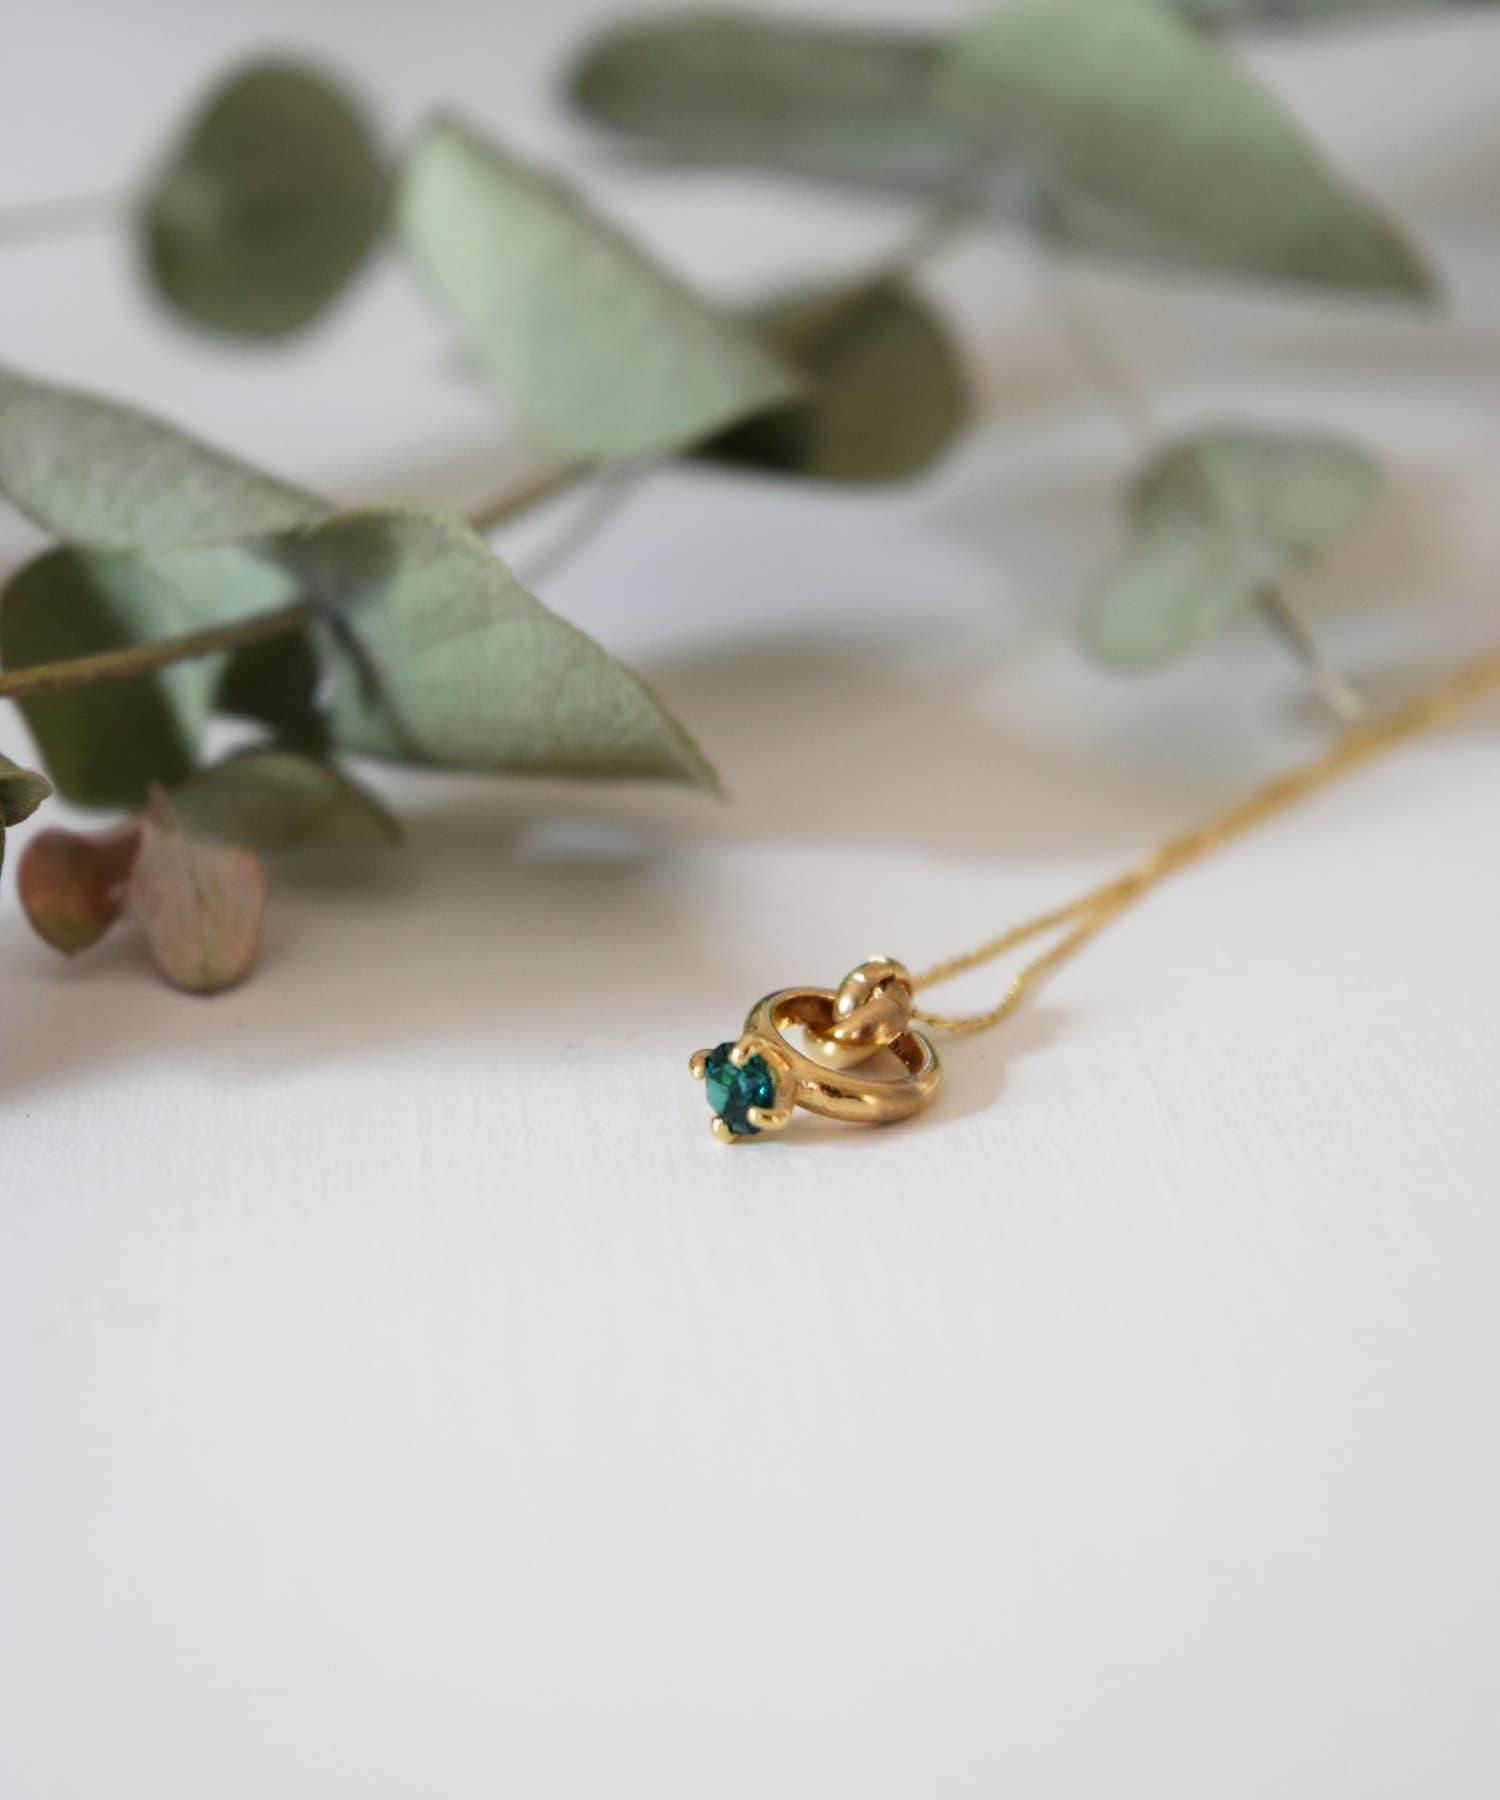 BIRTHDAY BAR(バースデイバー) レディース Birthstone Petit Ring Necklace 誕生石ネックレス グリーン